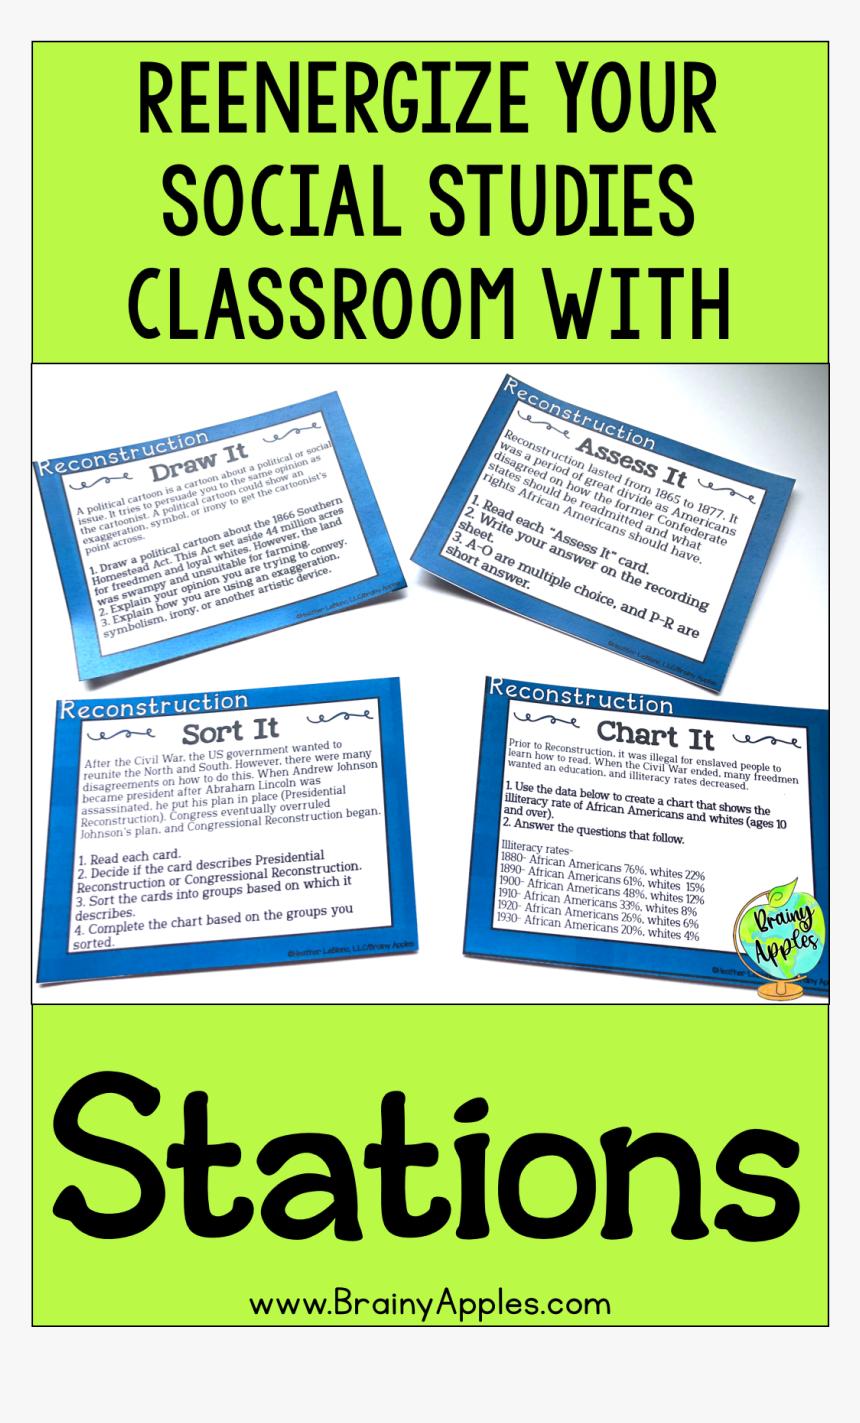 High School Social Studies Classroom Ideas, HD Png Download, Free Download